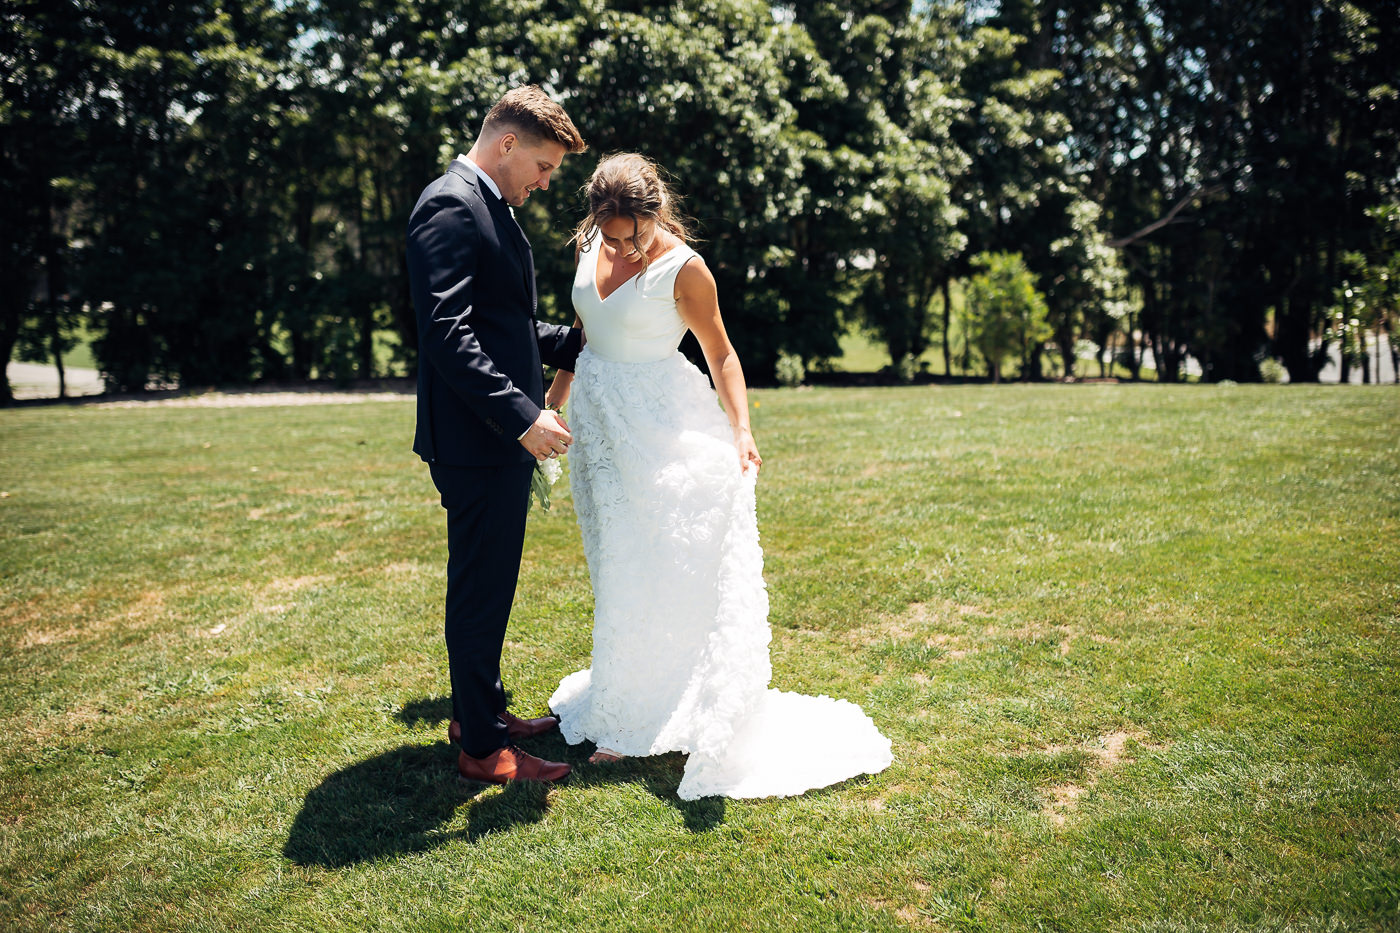 Anne-Hilde & Pieter - januarbryllup i slående vakre Tauranga, New Zealand Bryllupsfotograf New Zealand strand 29 Brudepar